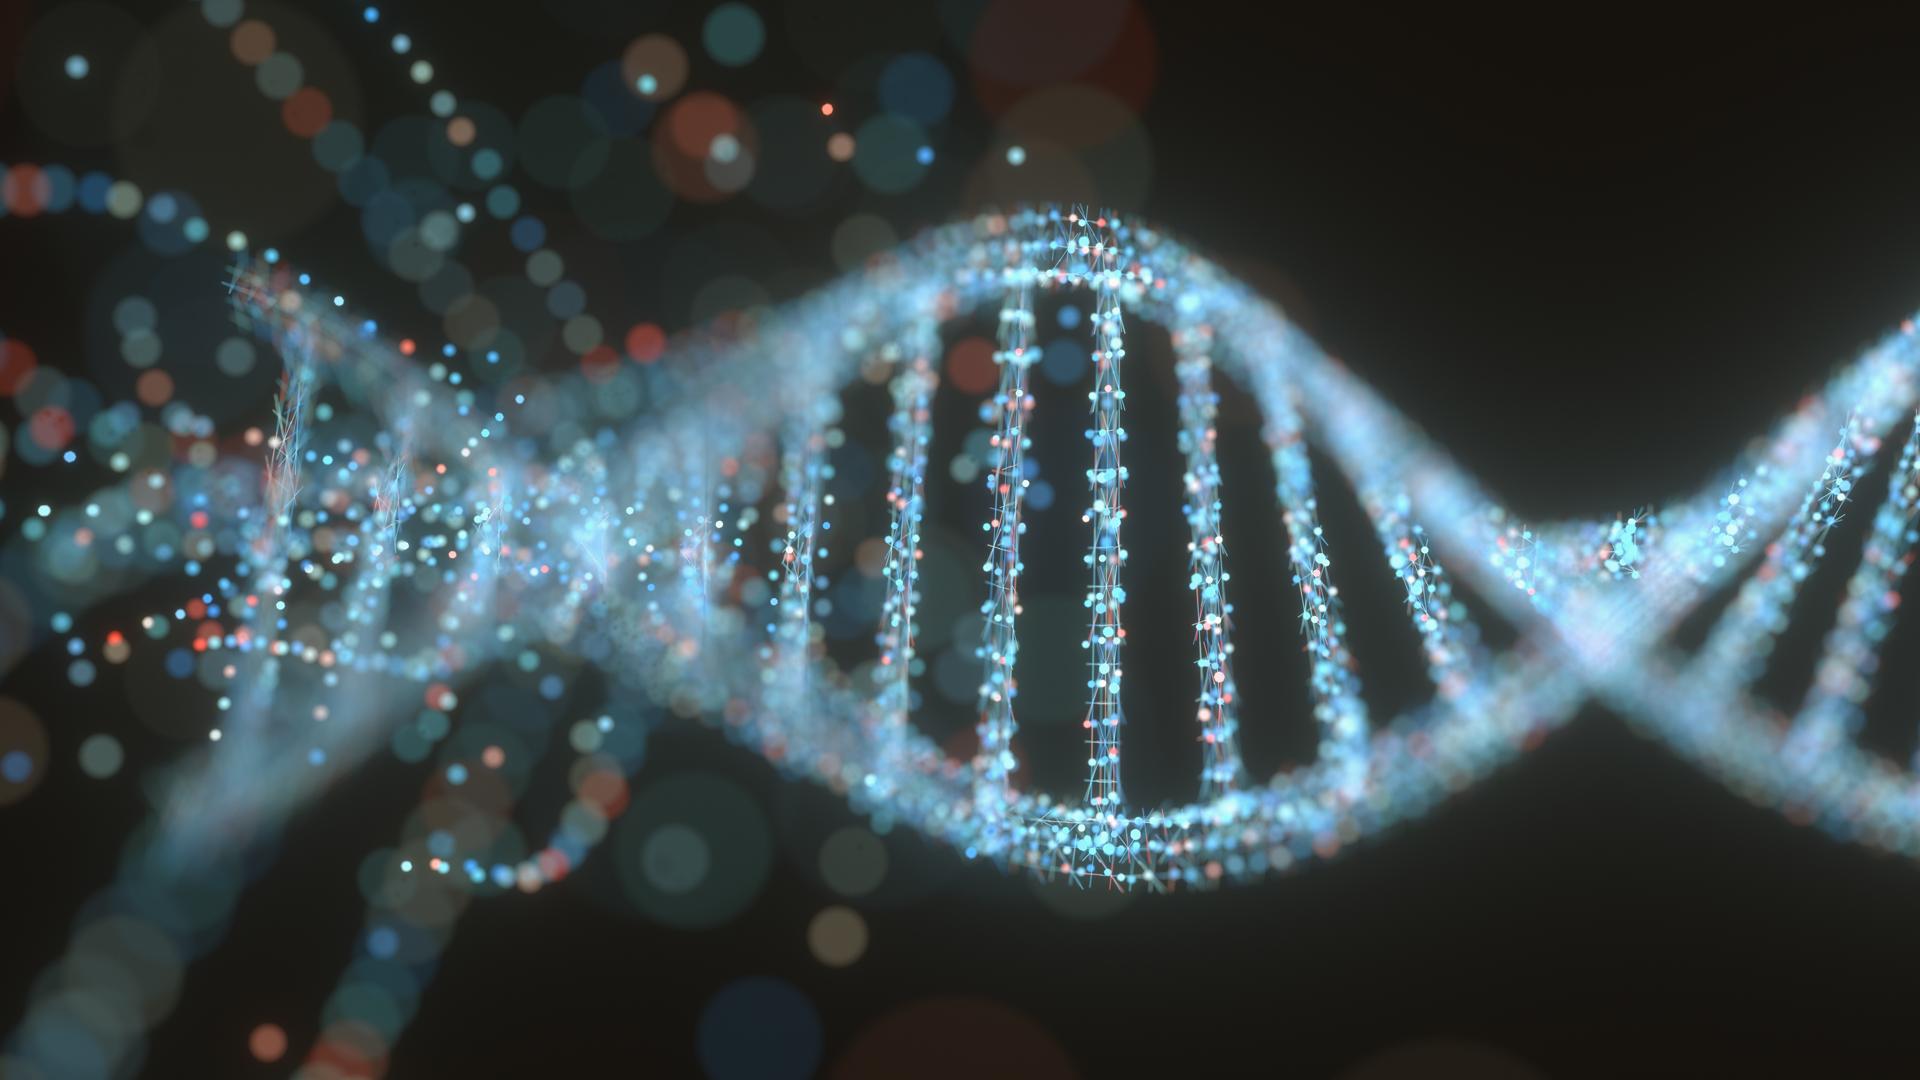 Patent office reopens major CRISPR battle between Broad Institute and Univ. of California